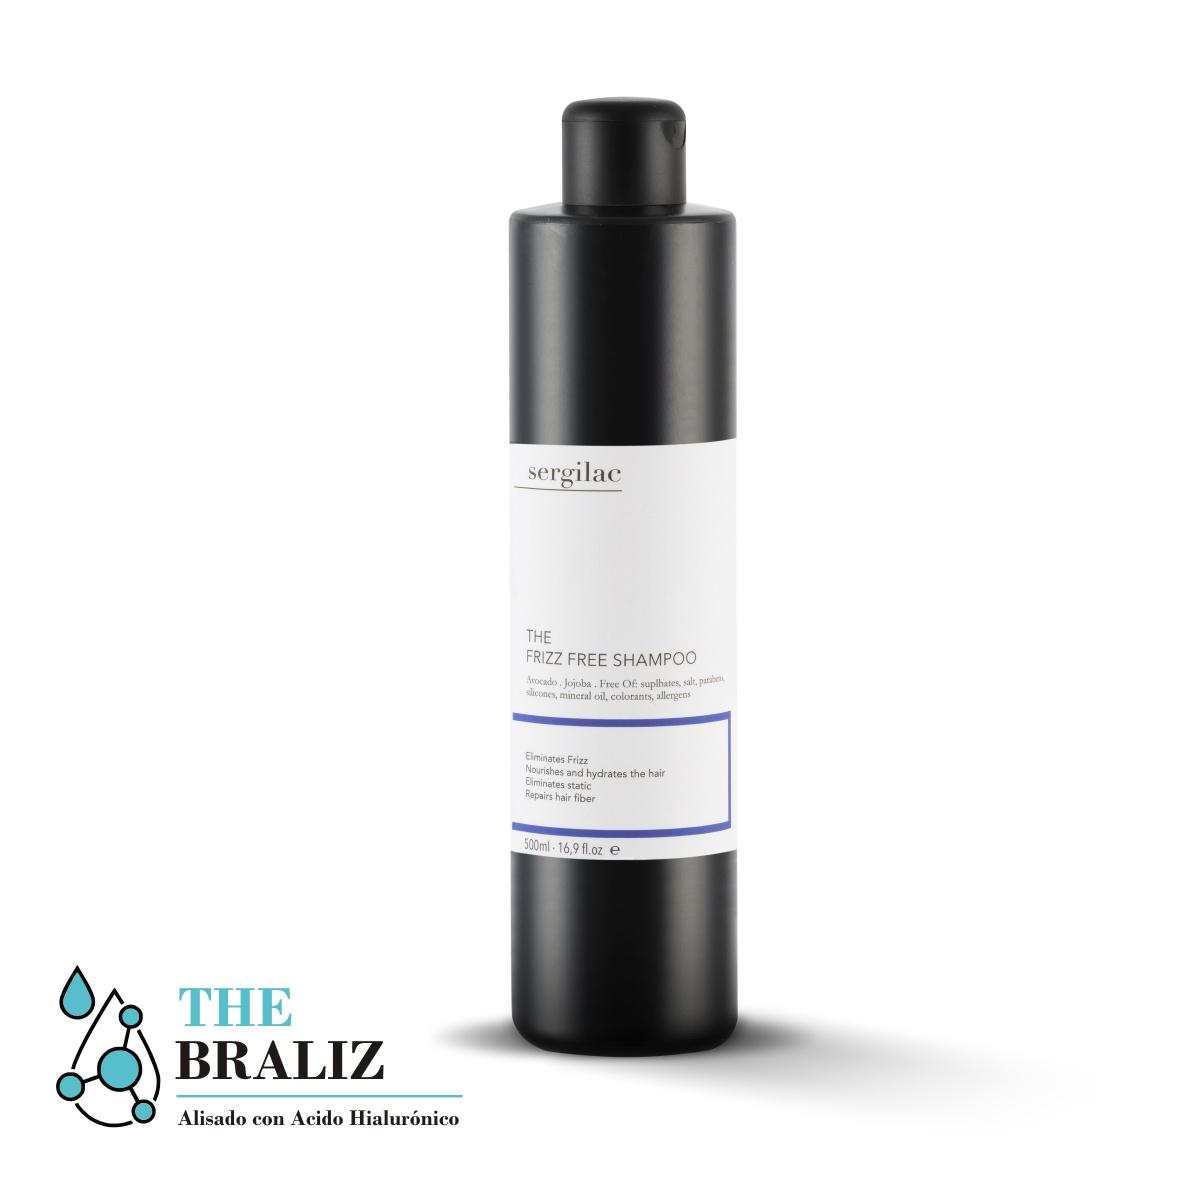 The Frizz Free Shampoo